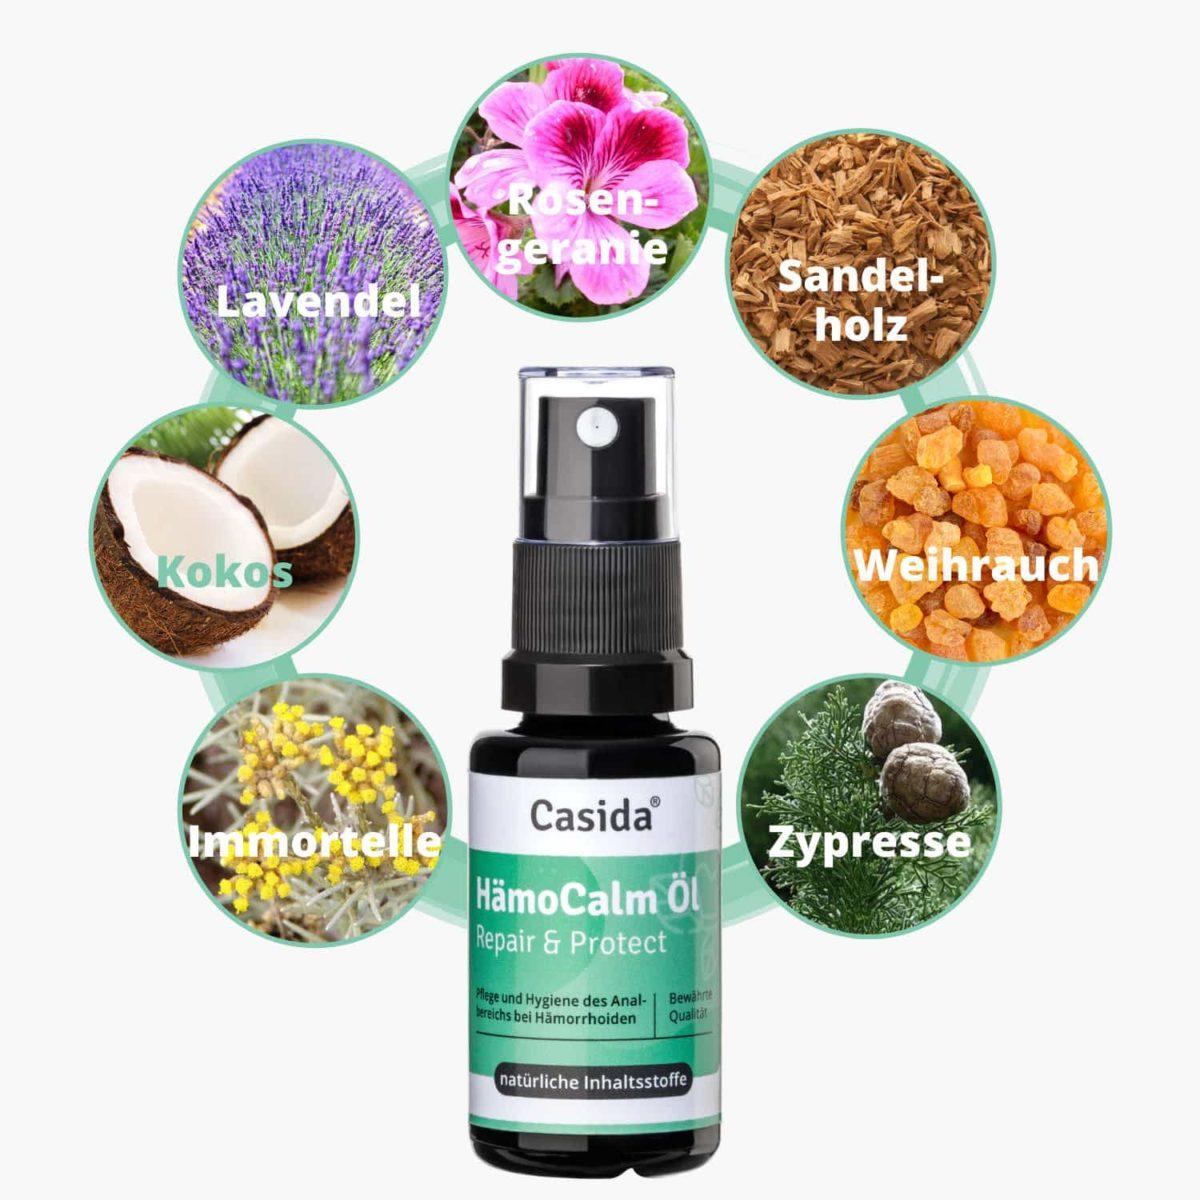 Casida HämoCalm Repair & Protect – 20 ml 10086675 PZN Apotheke hämorrhoiden hämmoritten hemoriden3